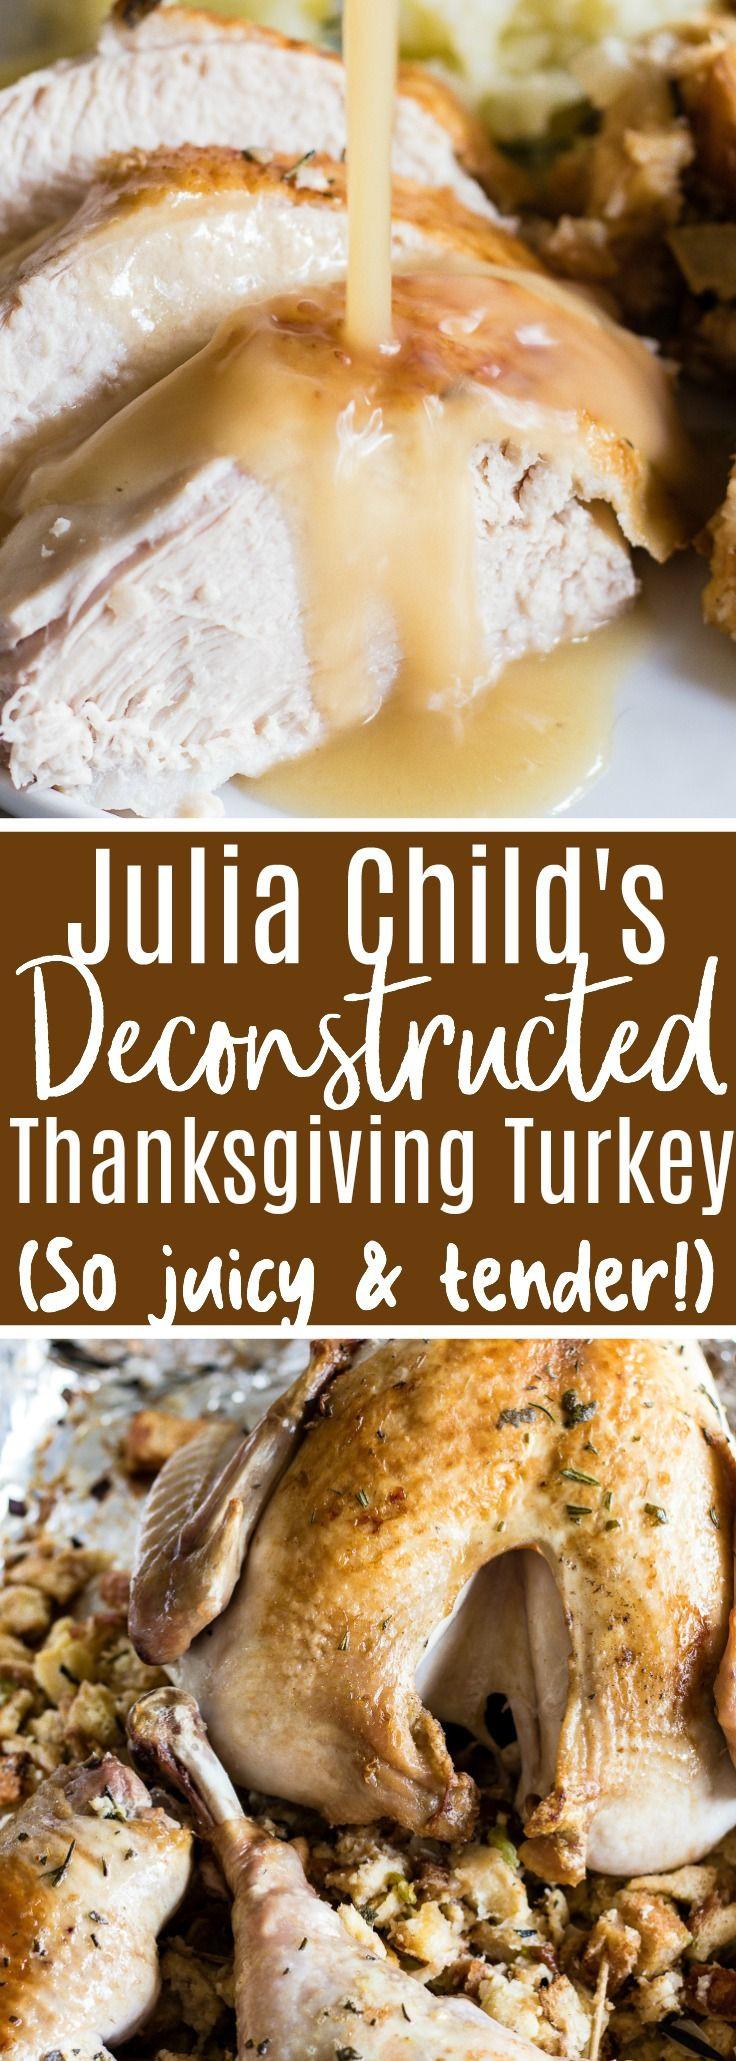 Julia Child Thanksgiving Turkey  Best 25 Julia childs ideas on Pinterest